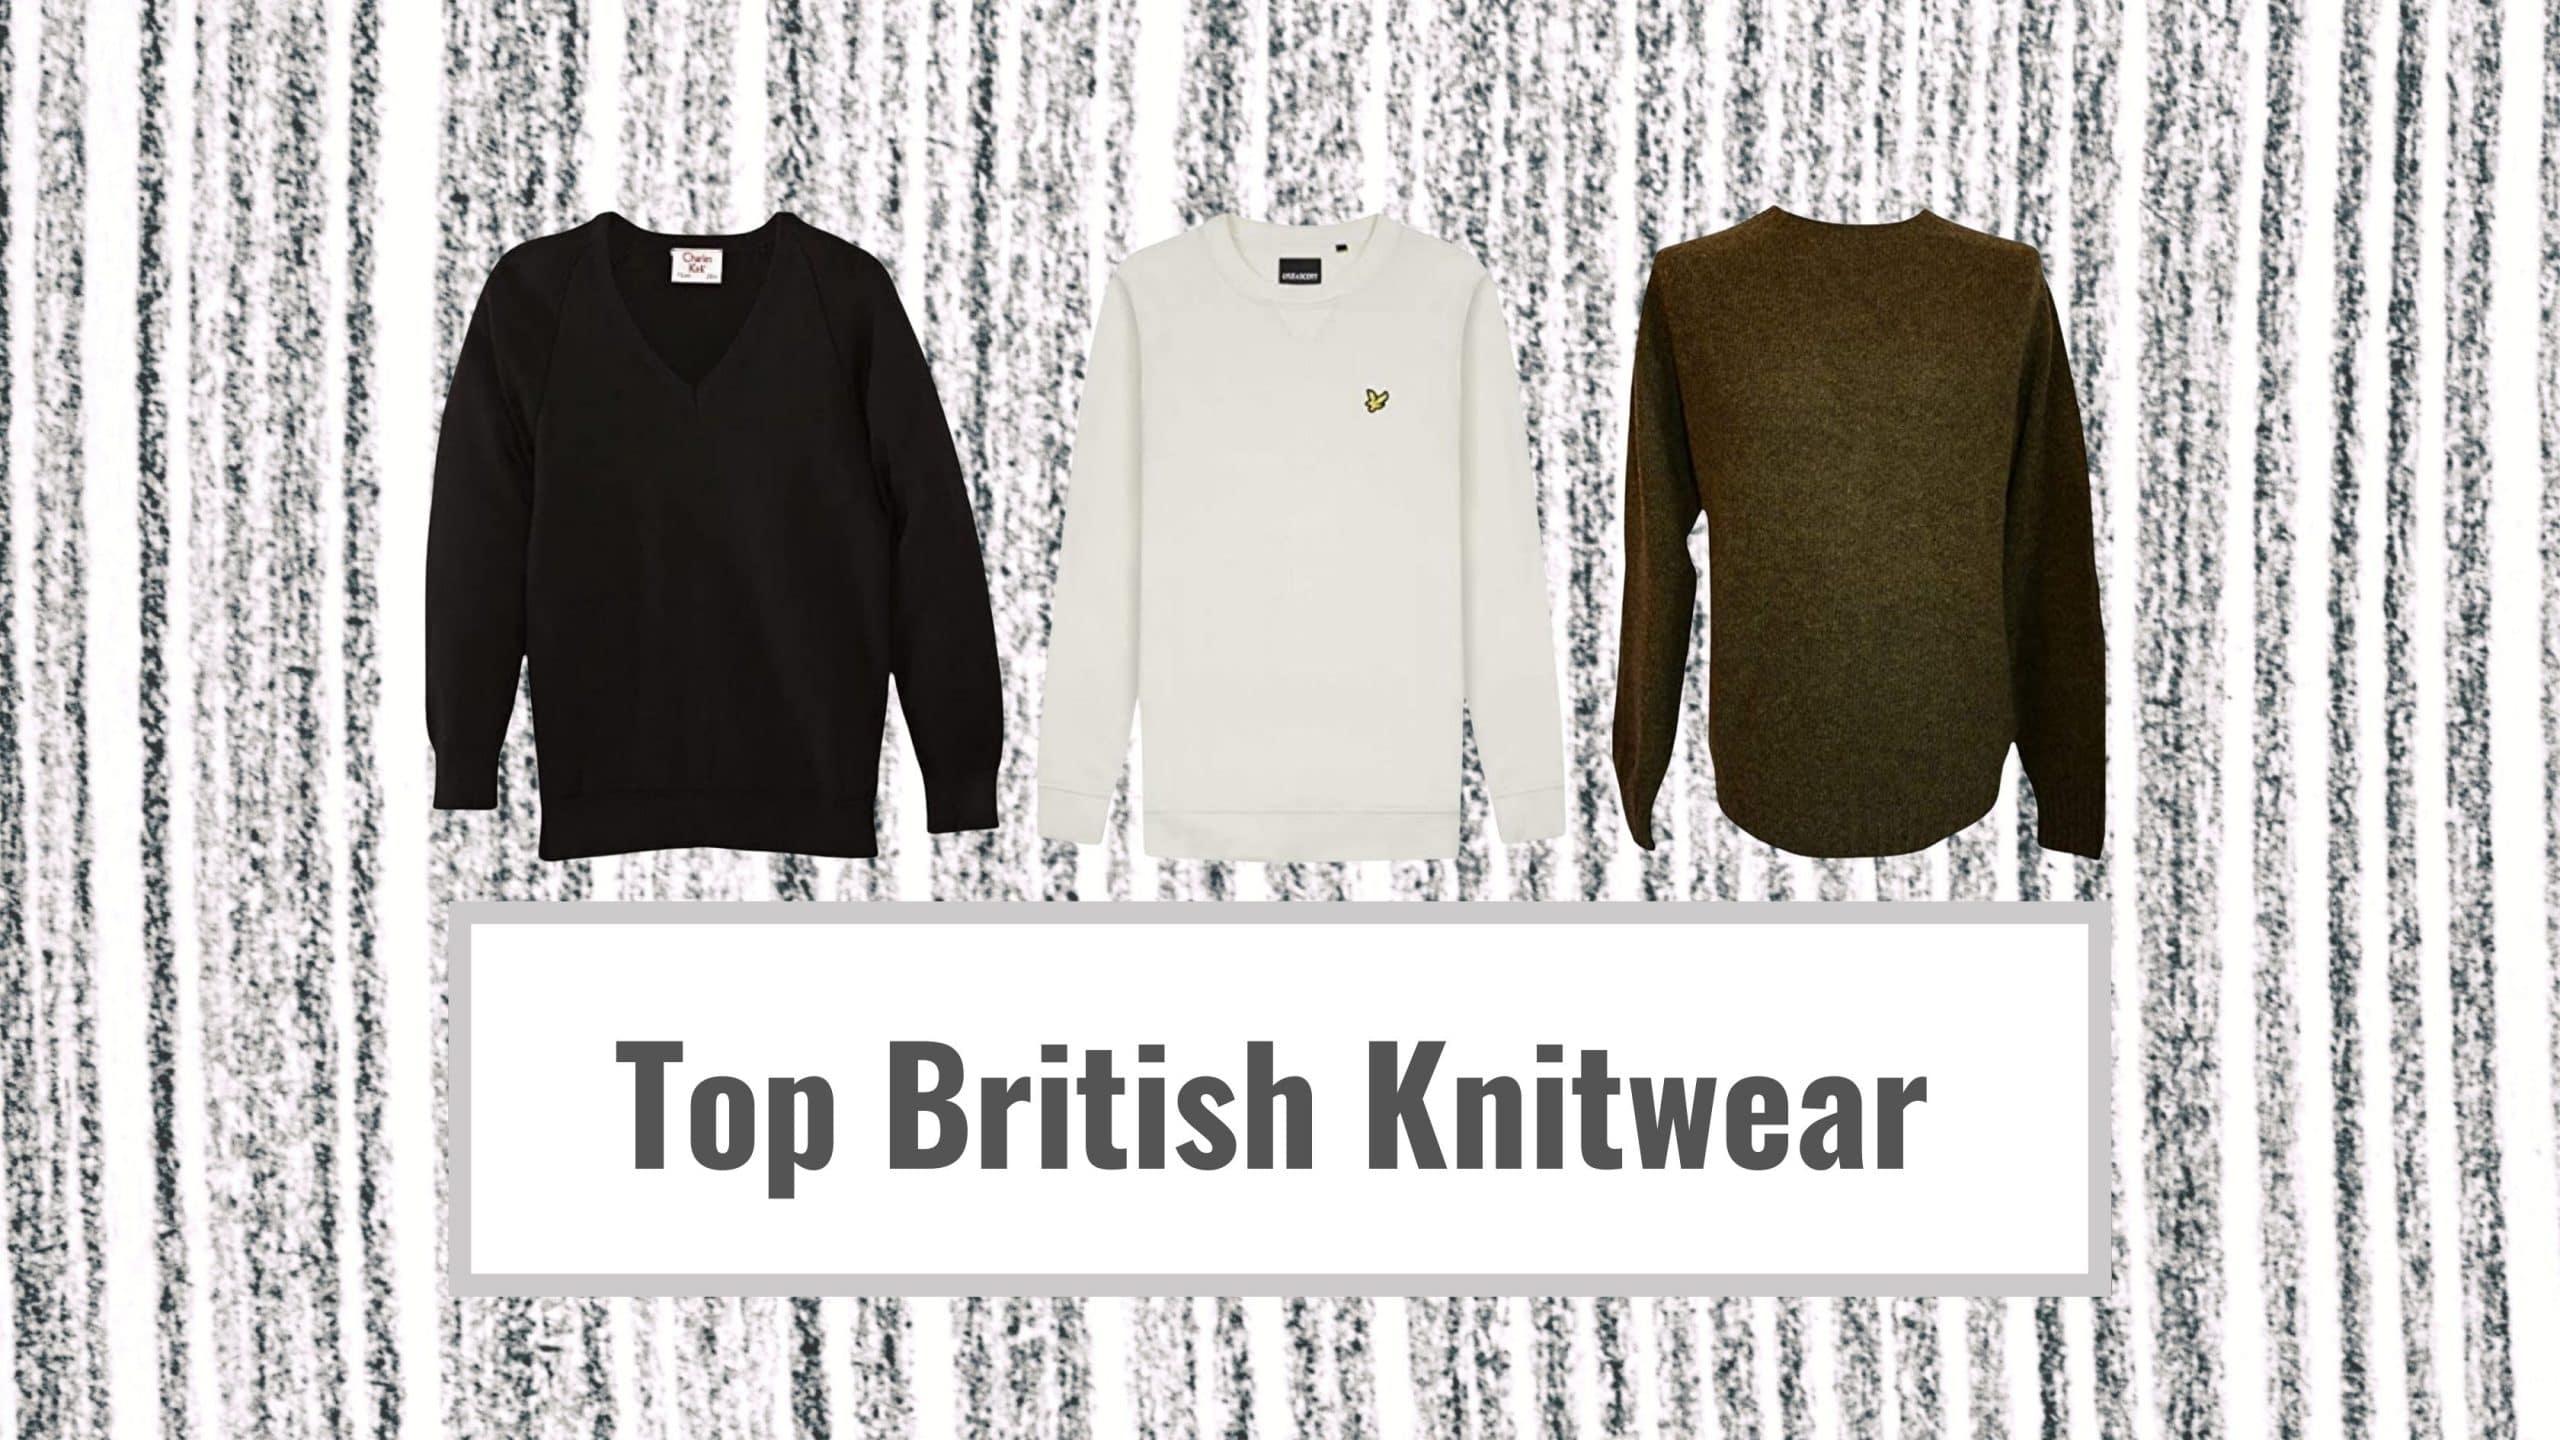 Top British Knitwear